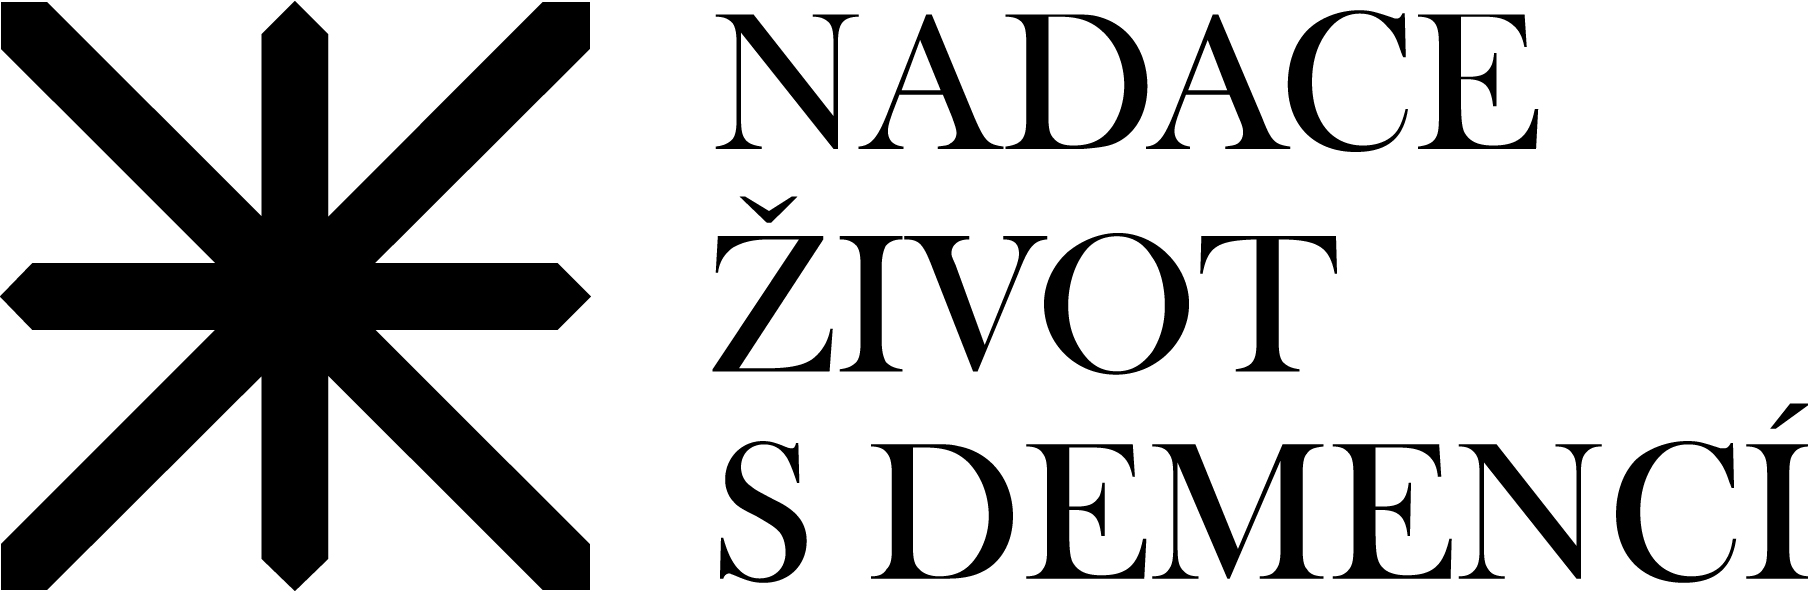 nadace_zivot_s_demenci_black.jpg (130 KB)